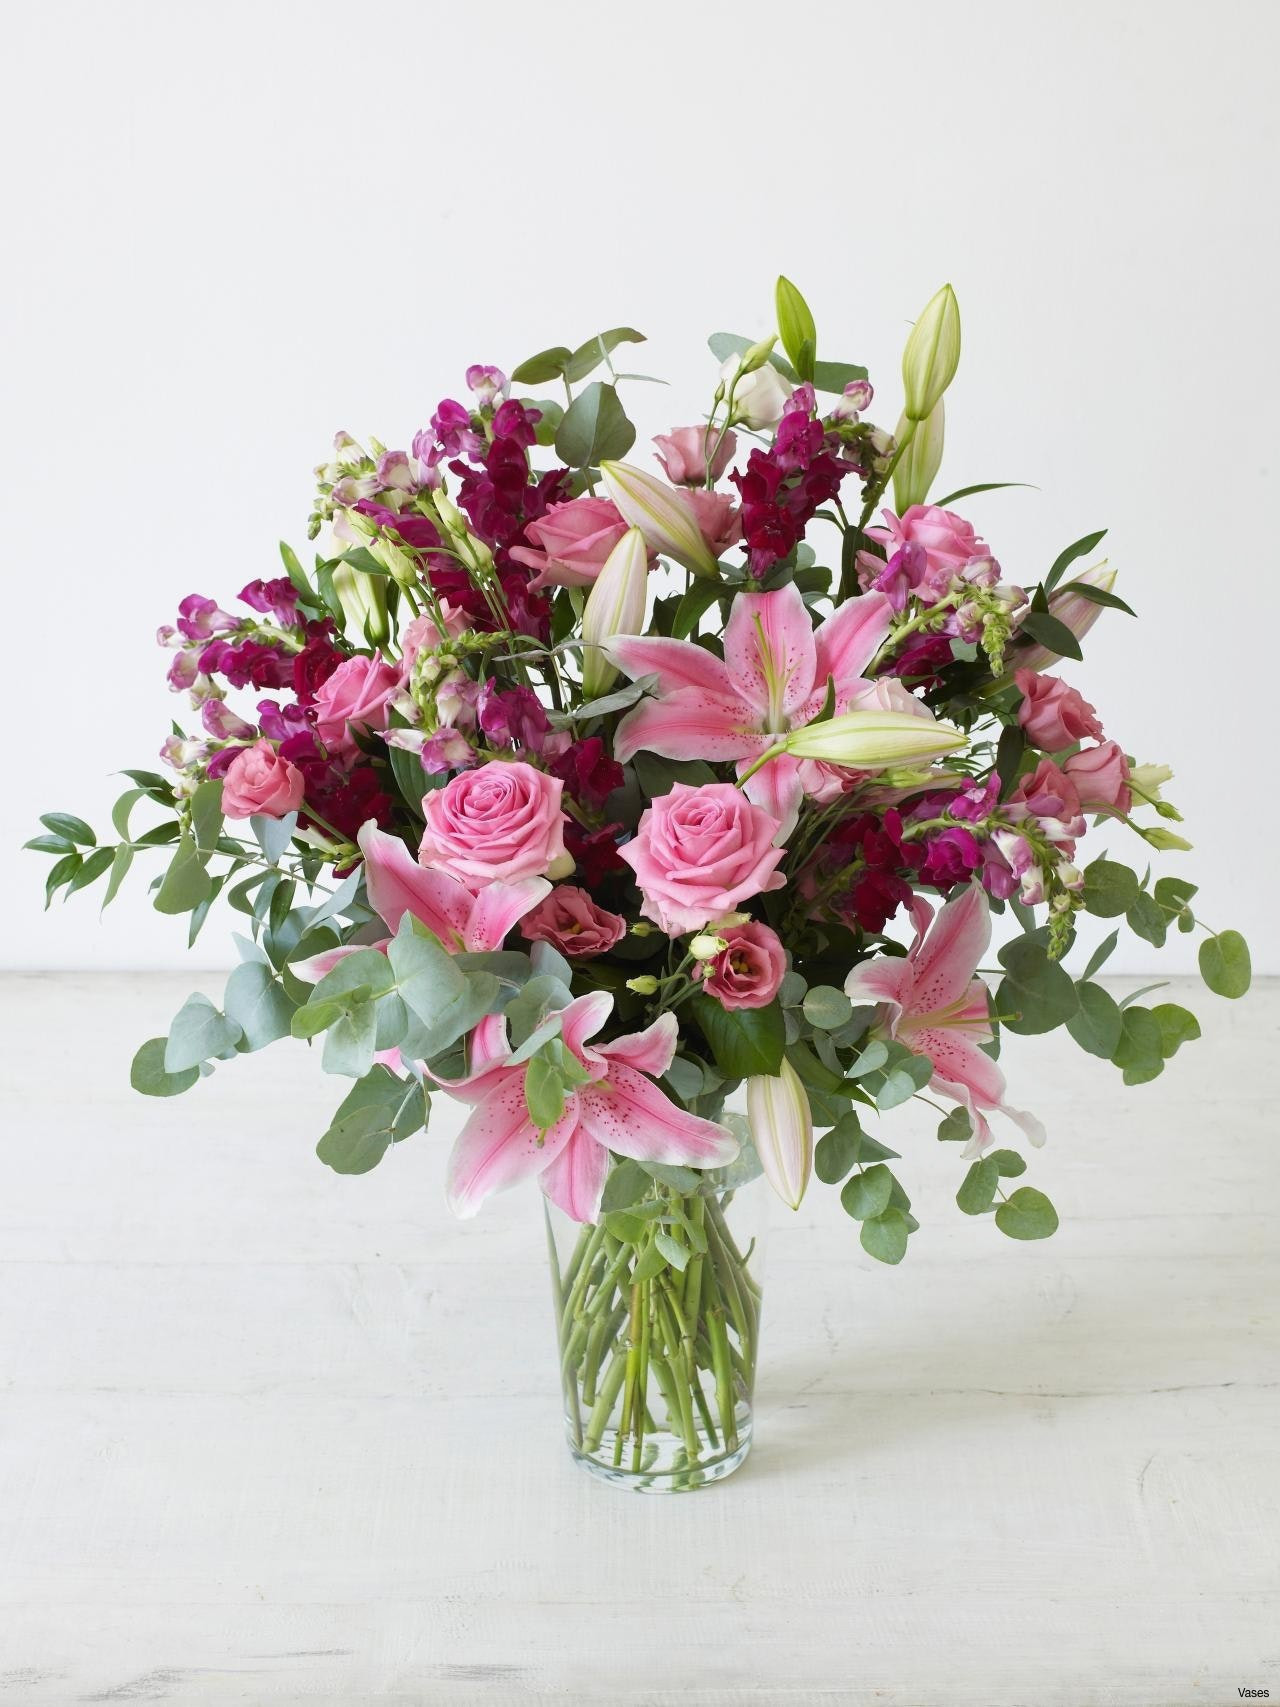 decorative branches for vases of 15 adorable artificial floral arrangements for dining table thunder intended for flower arrangements elegant floral arrangements 0d design ideas scheme artif